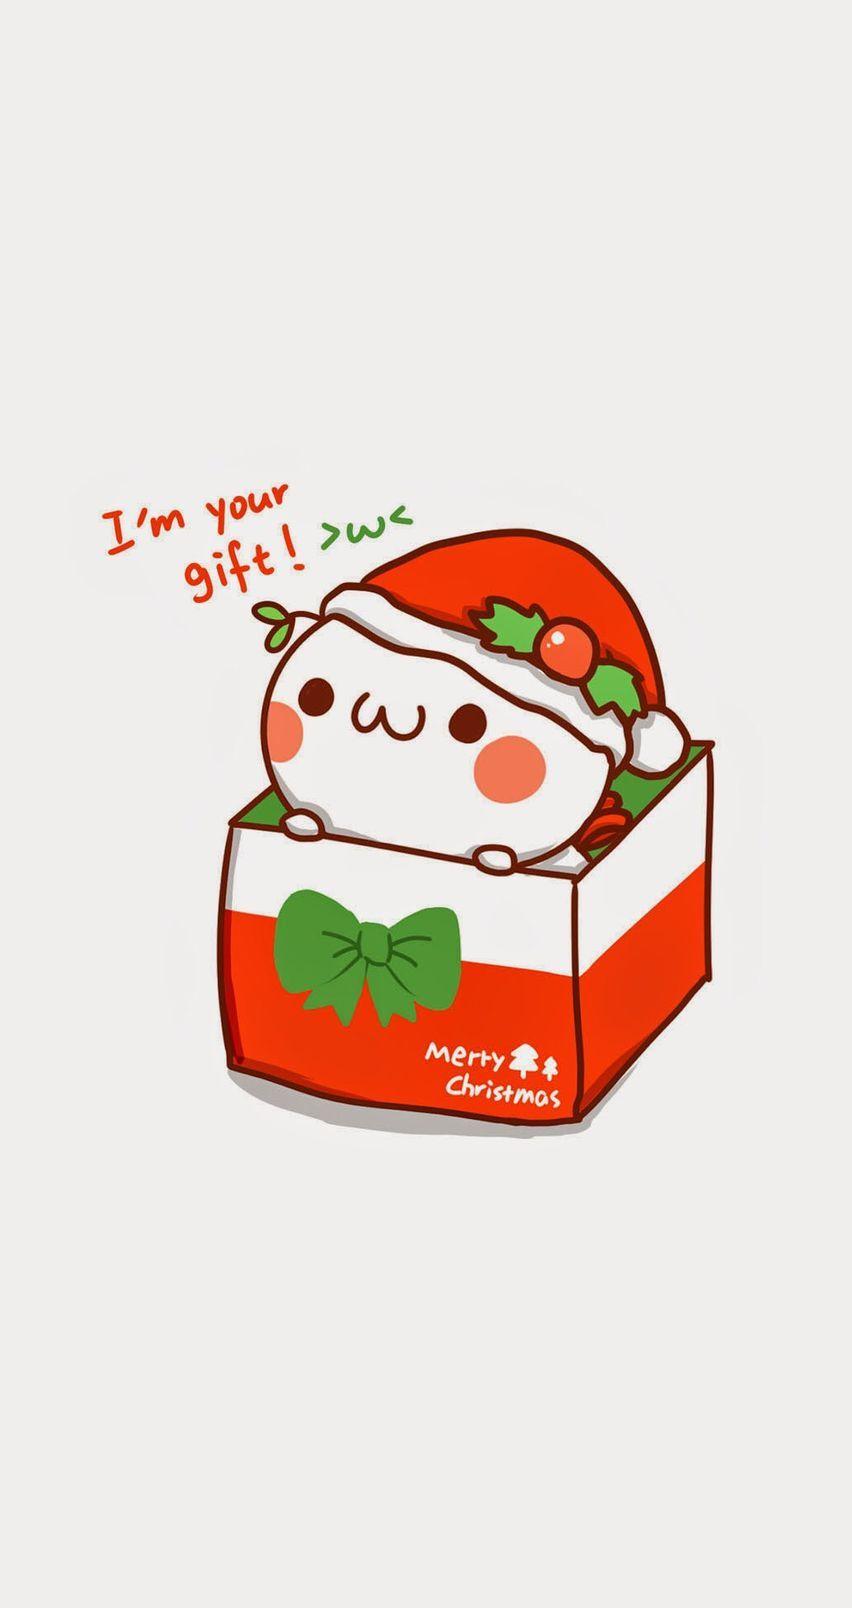 I M Your Gift Mobile9 Christmas Phone Wallpaper Wallpaper Iphone Christmas Cute Cartoon Wallpapers